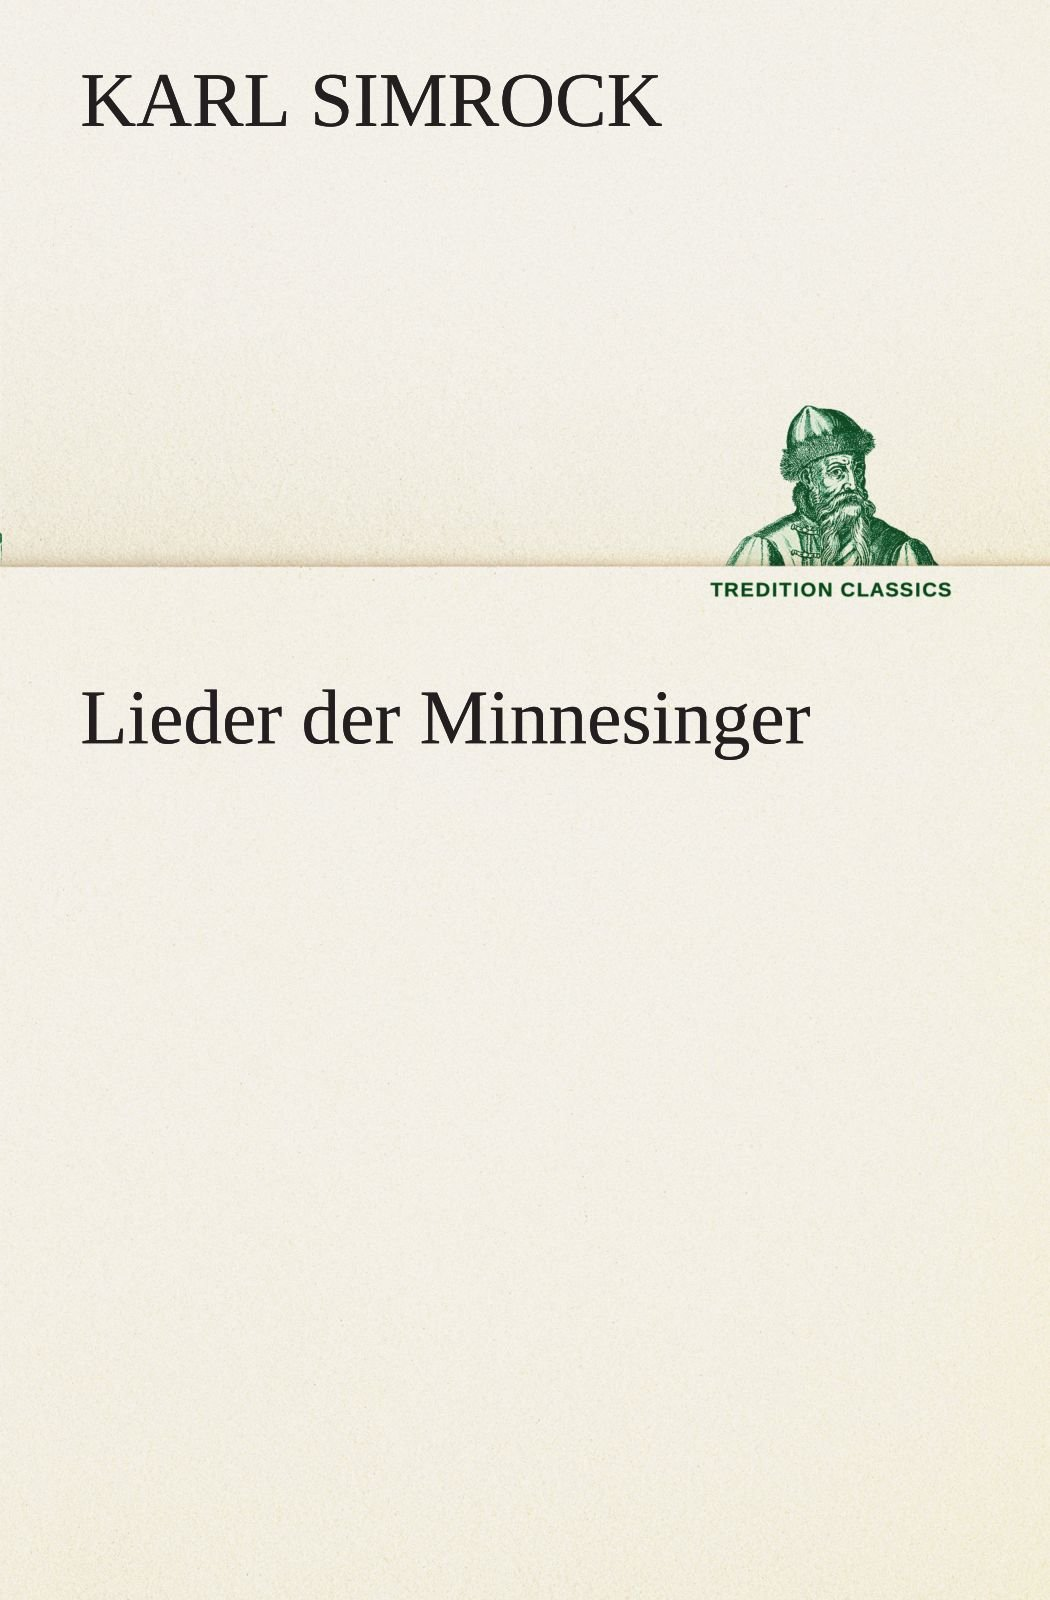 Lieder der Minnesinger (TREDITION CLASSICS) (German Edition) ebook